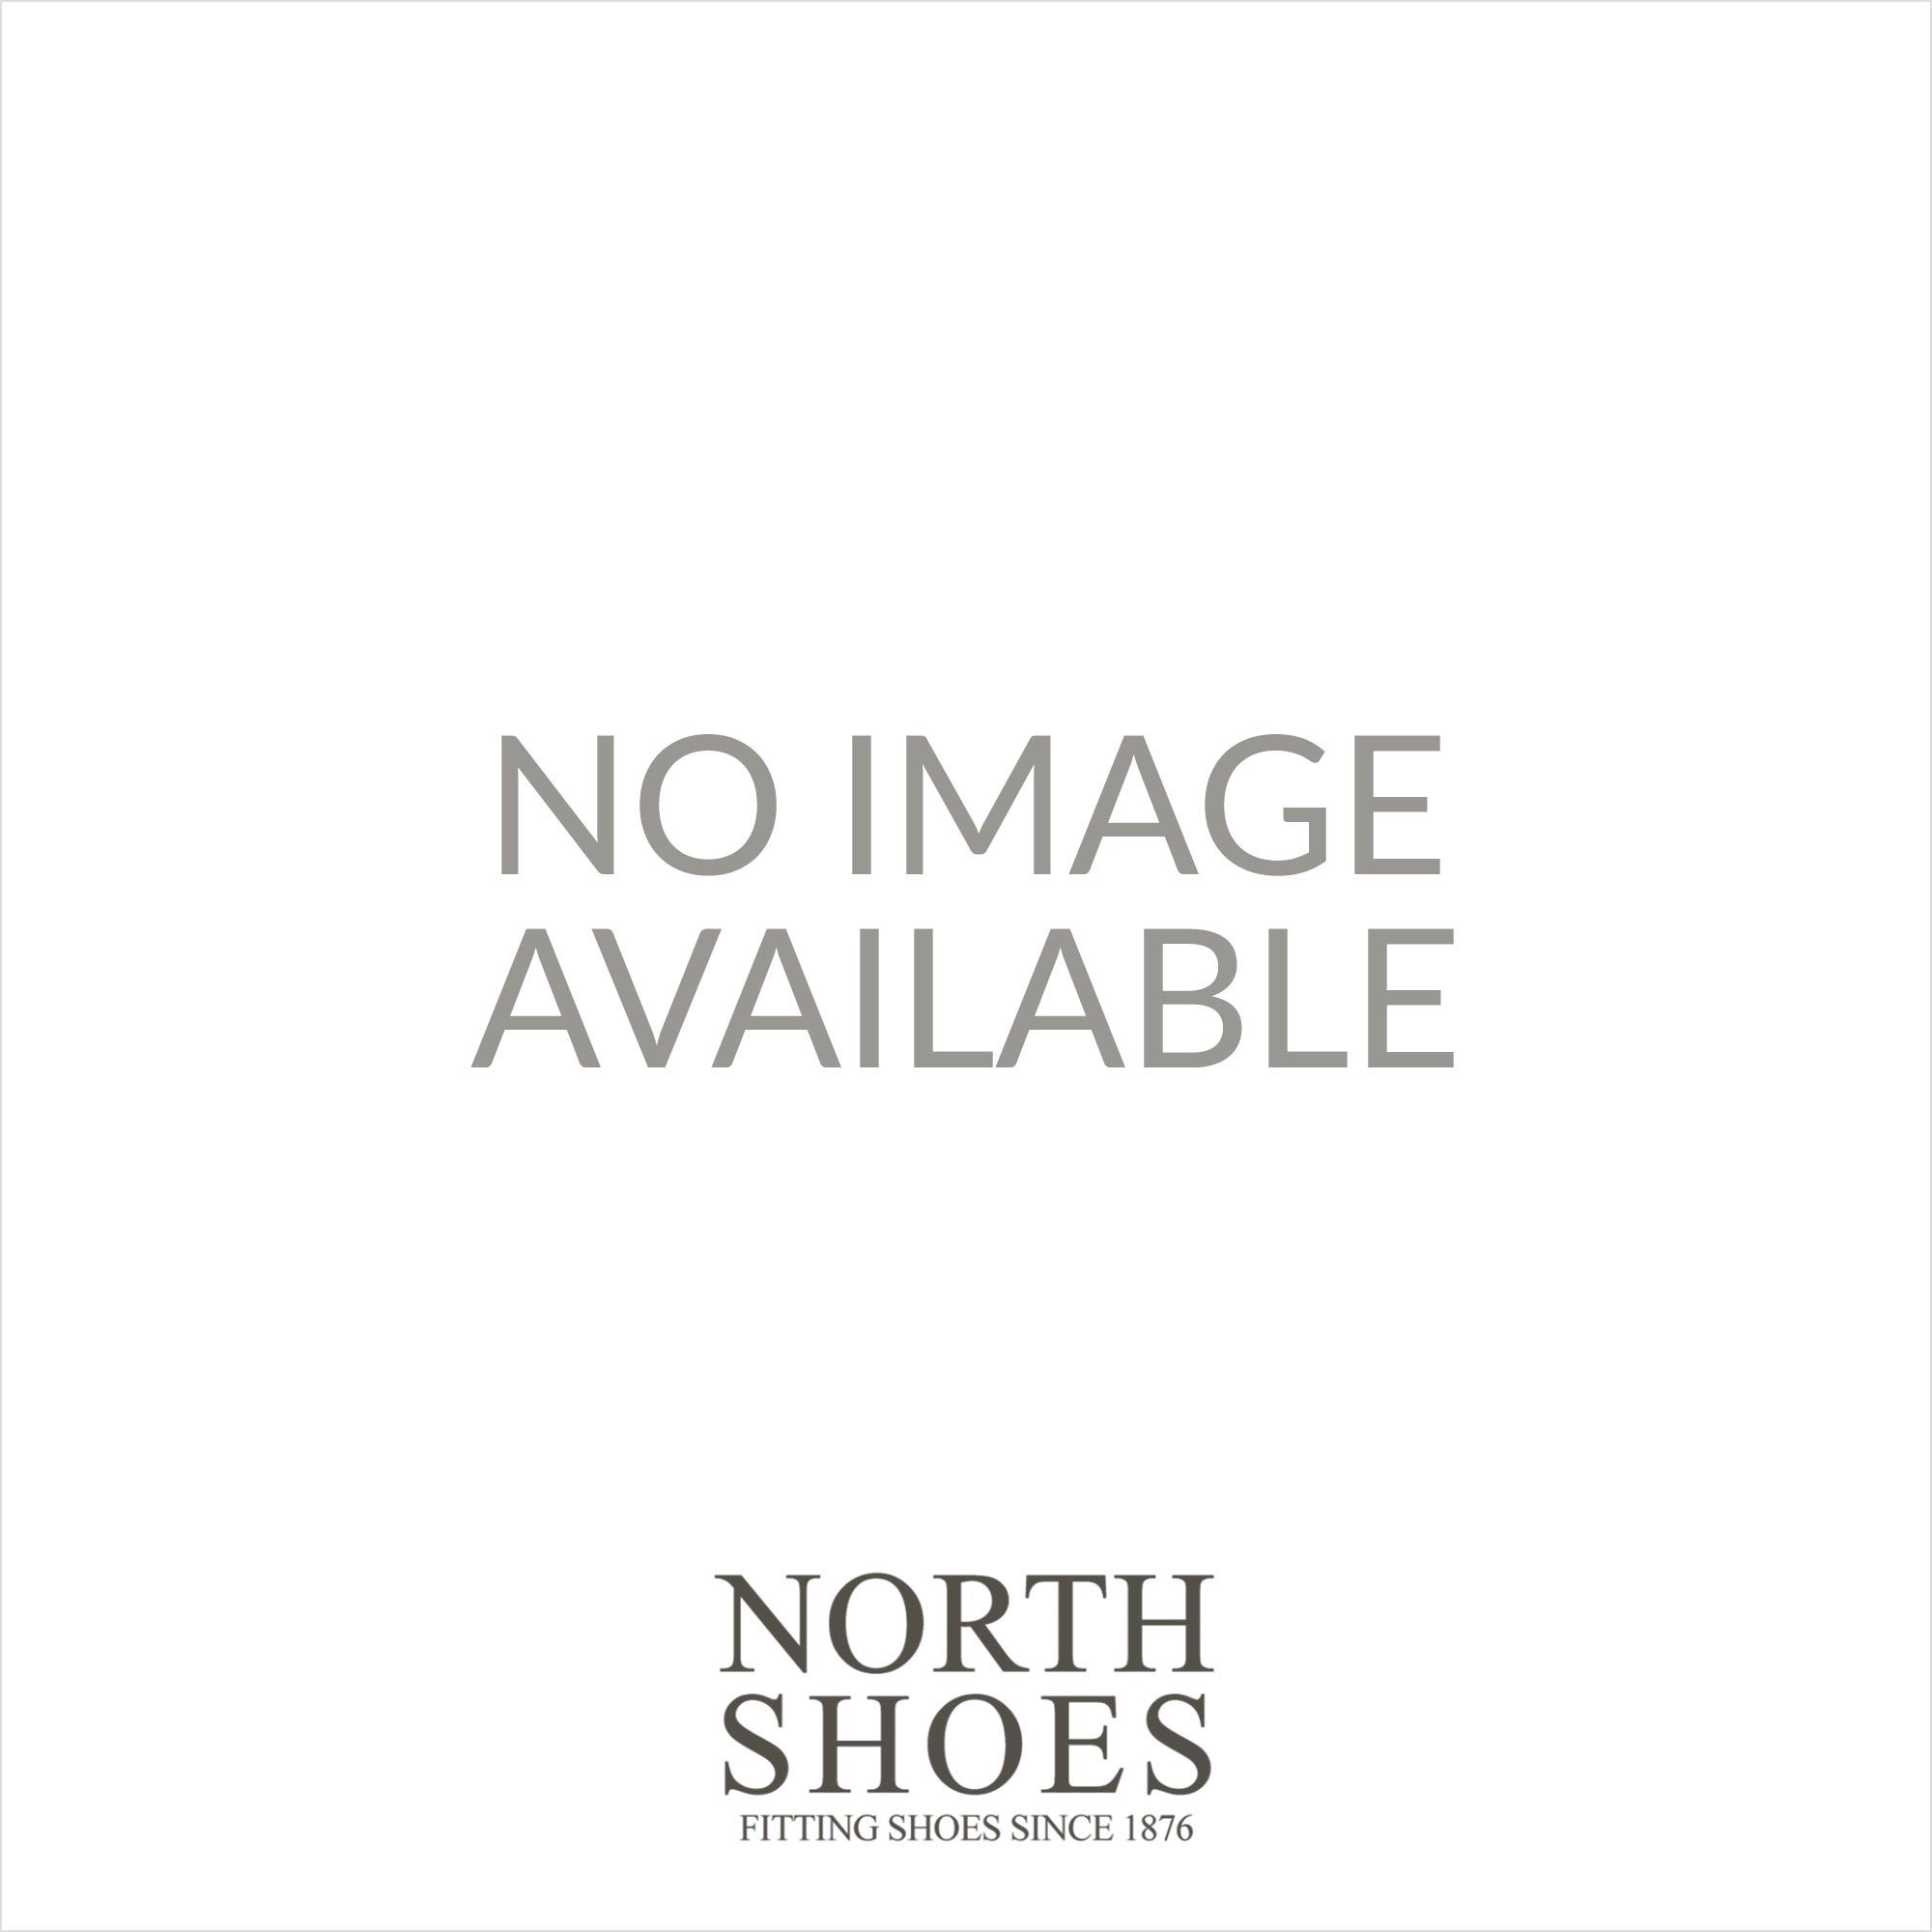 e9362cce056e Tamaris 29400-20 Taupe Leather Womens Slingback Shoe - Tamaris from ...